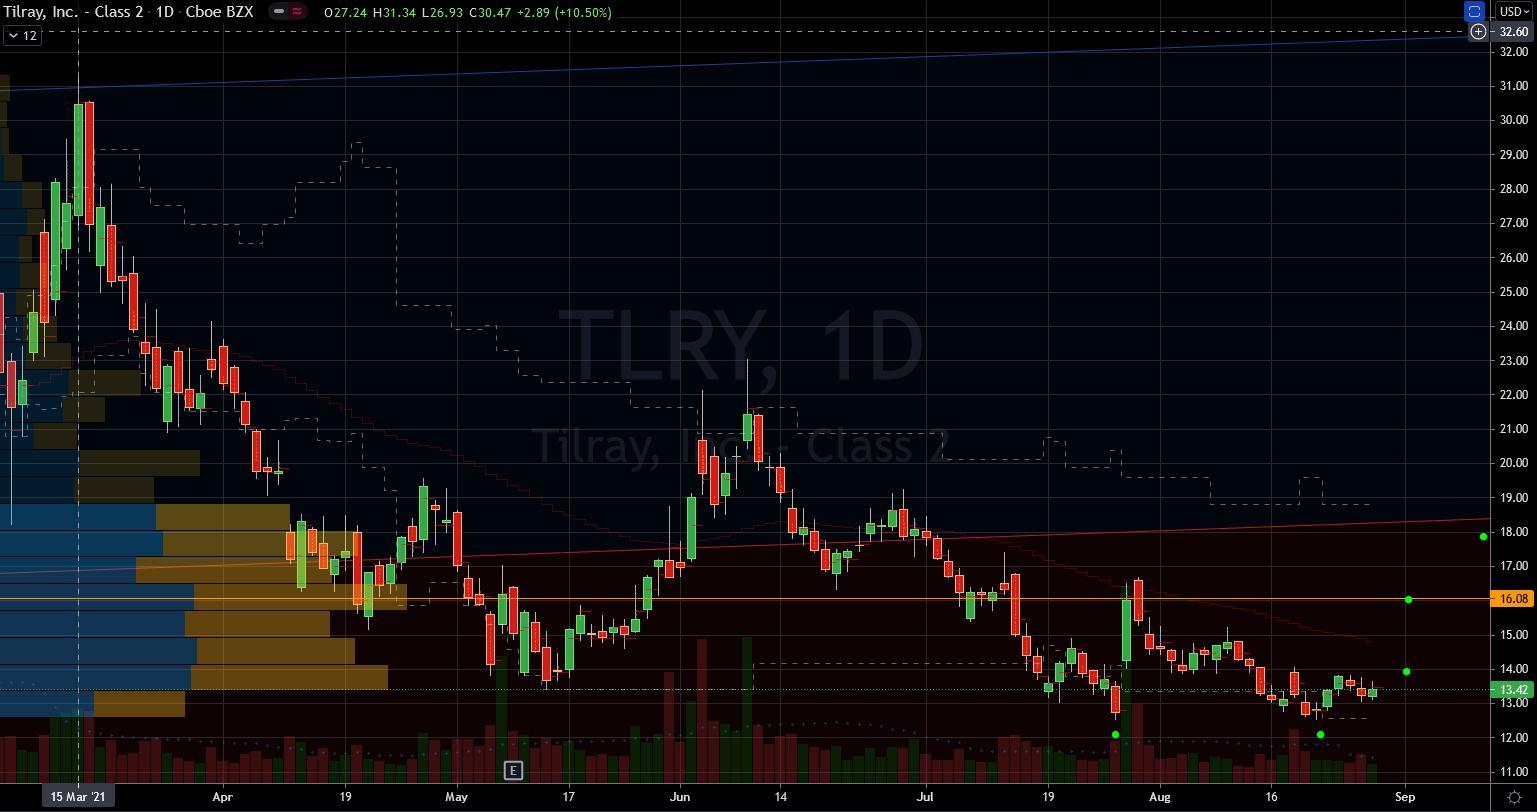 Tilray (TLRY) Stock Chart Showing Short Term Base